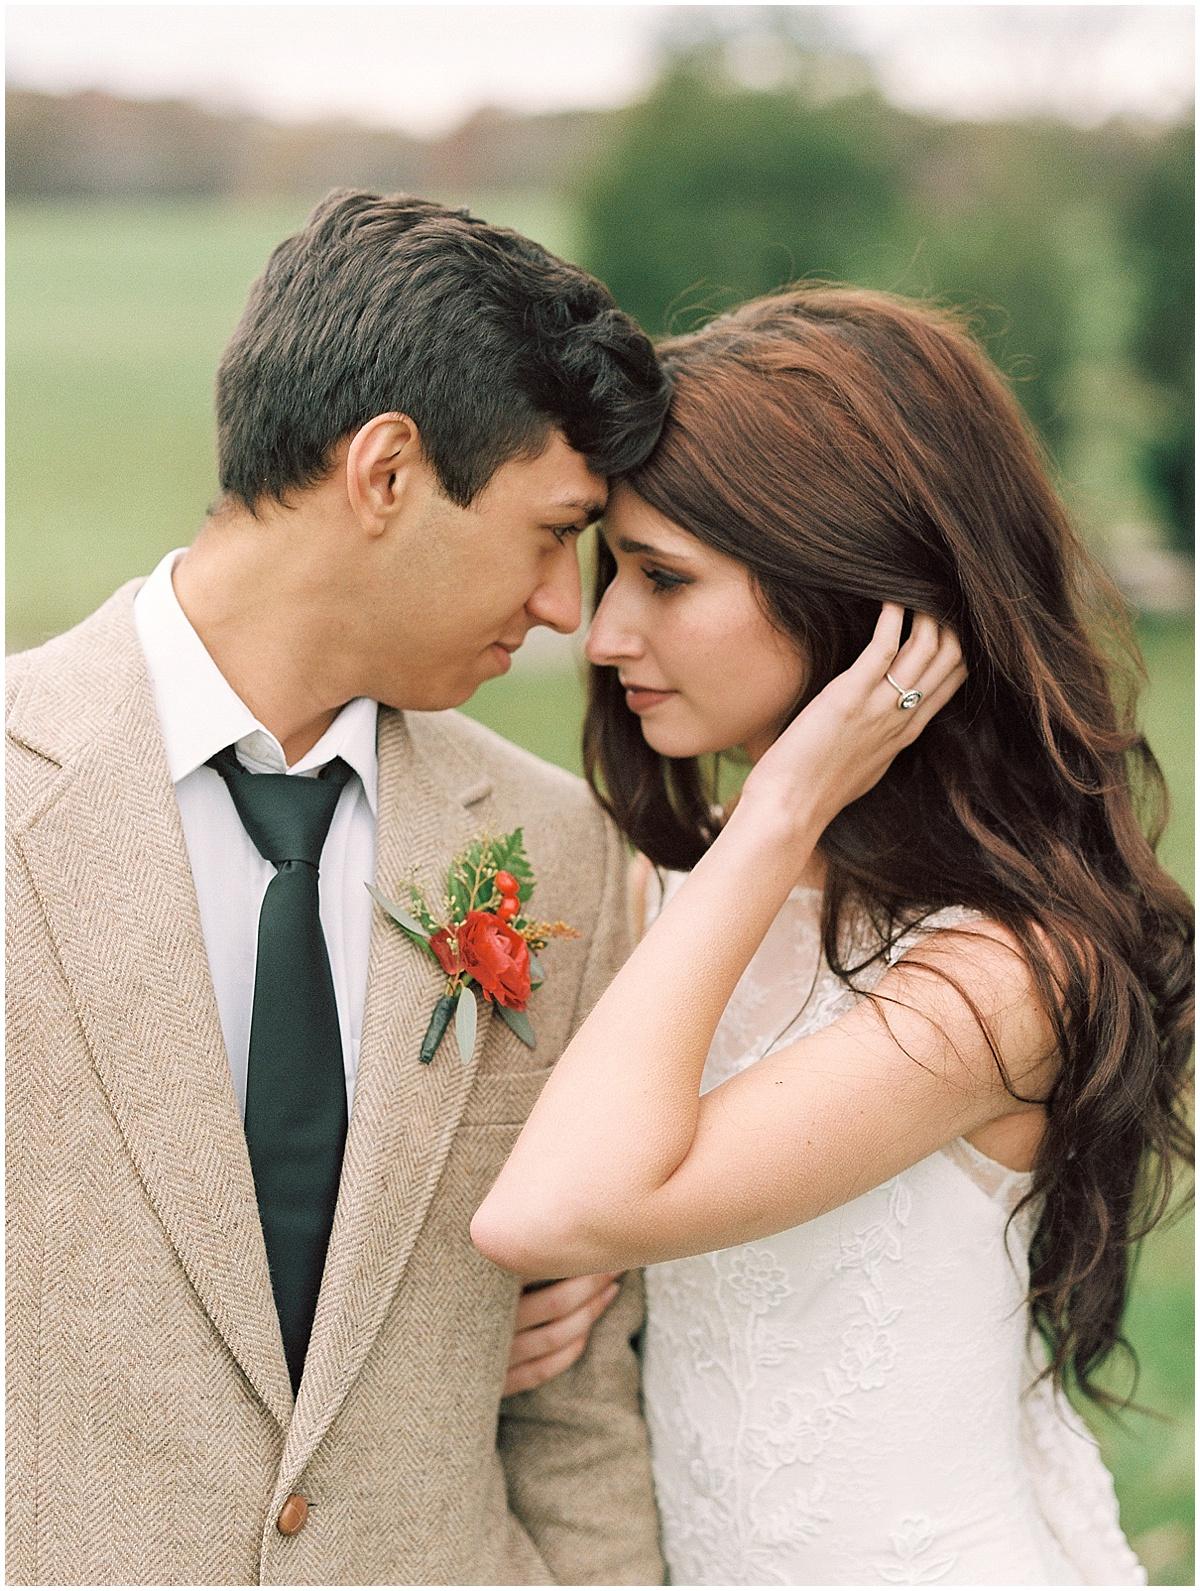 Abigail_Malone_Fall_Wedding_Knoxville_Film_Portra_400_Kodak_Mountain_Views_Abby_Elizabeth-34.jpg